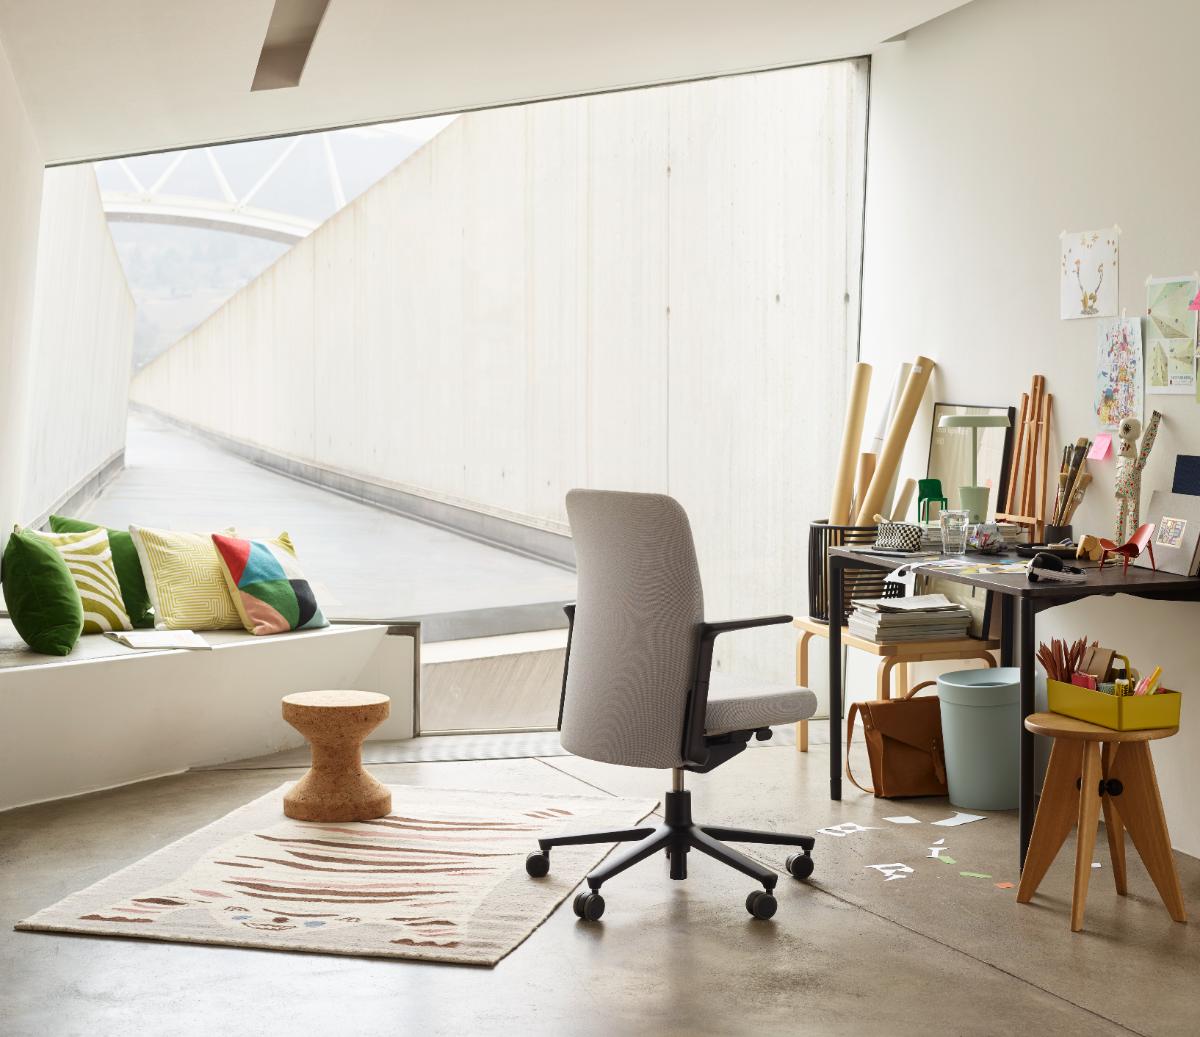 Vitra office lifestyle minima birmingham